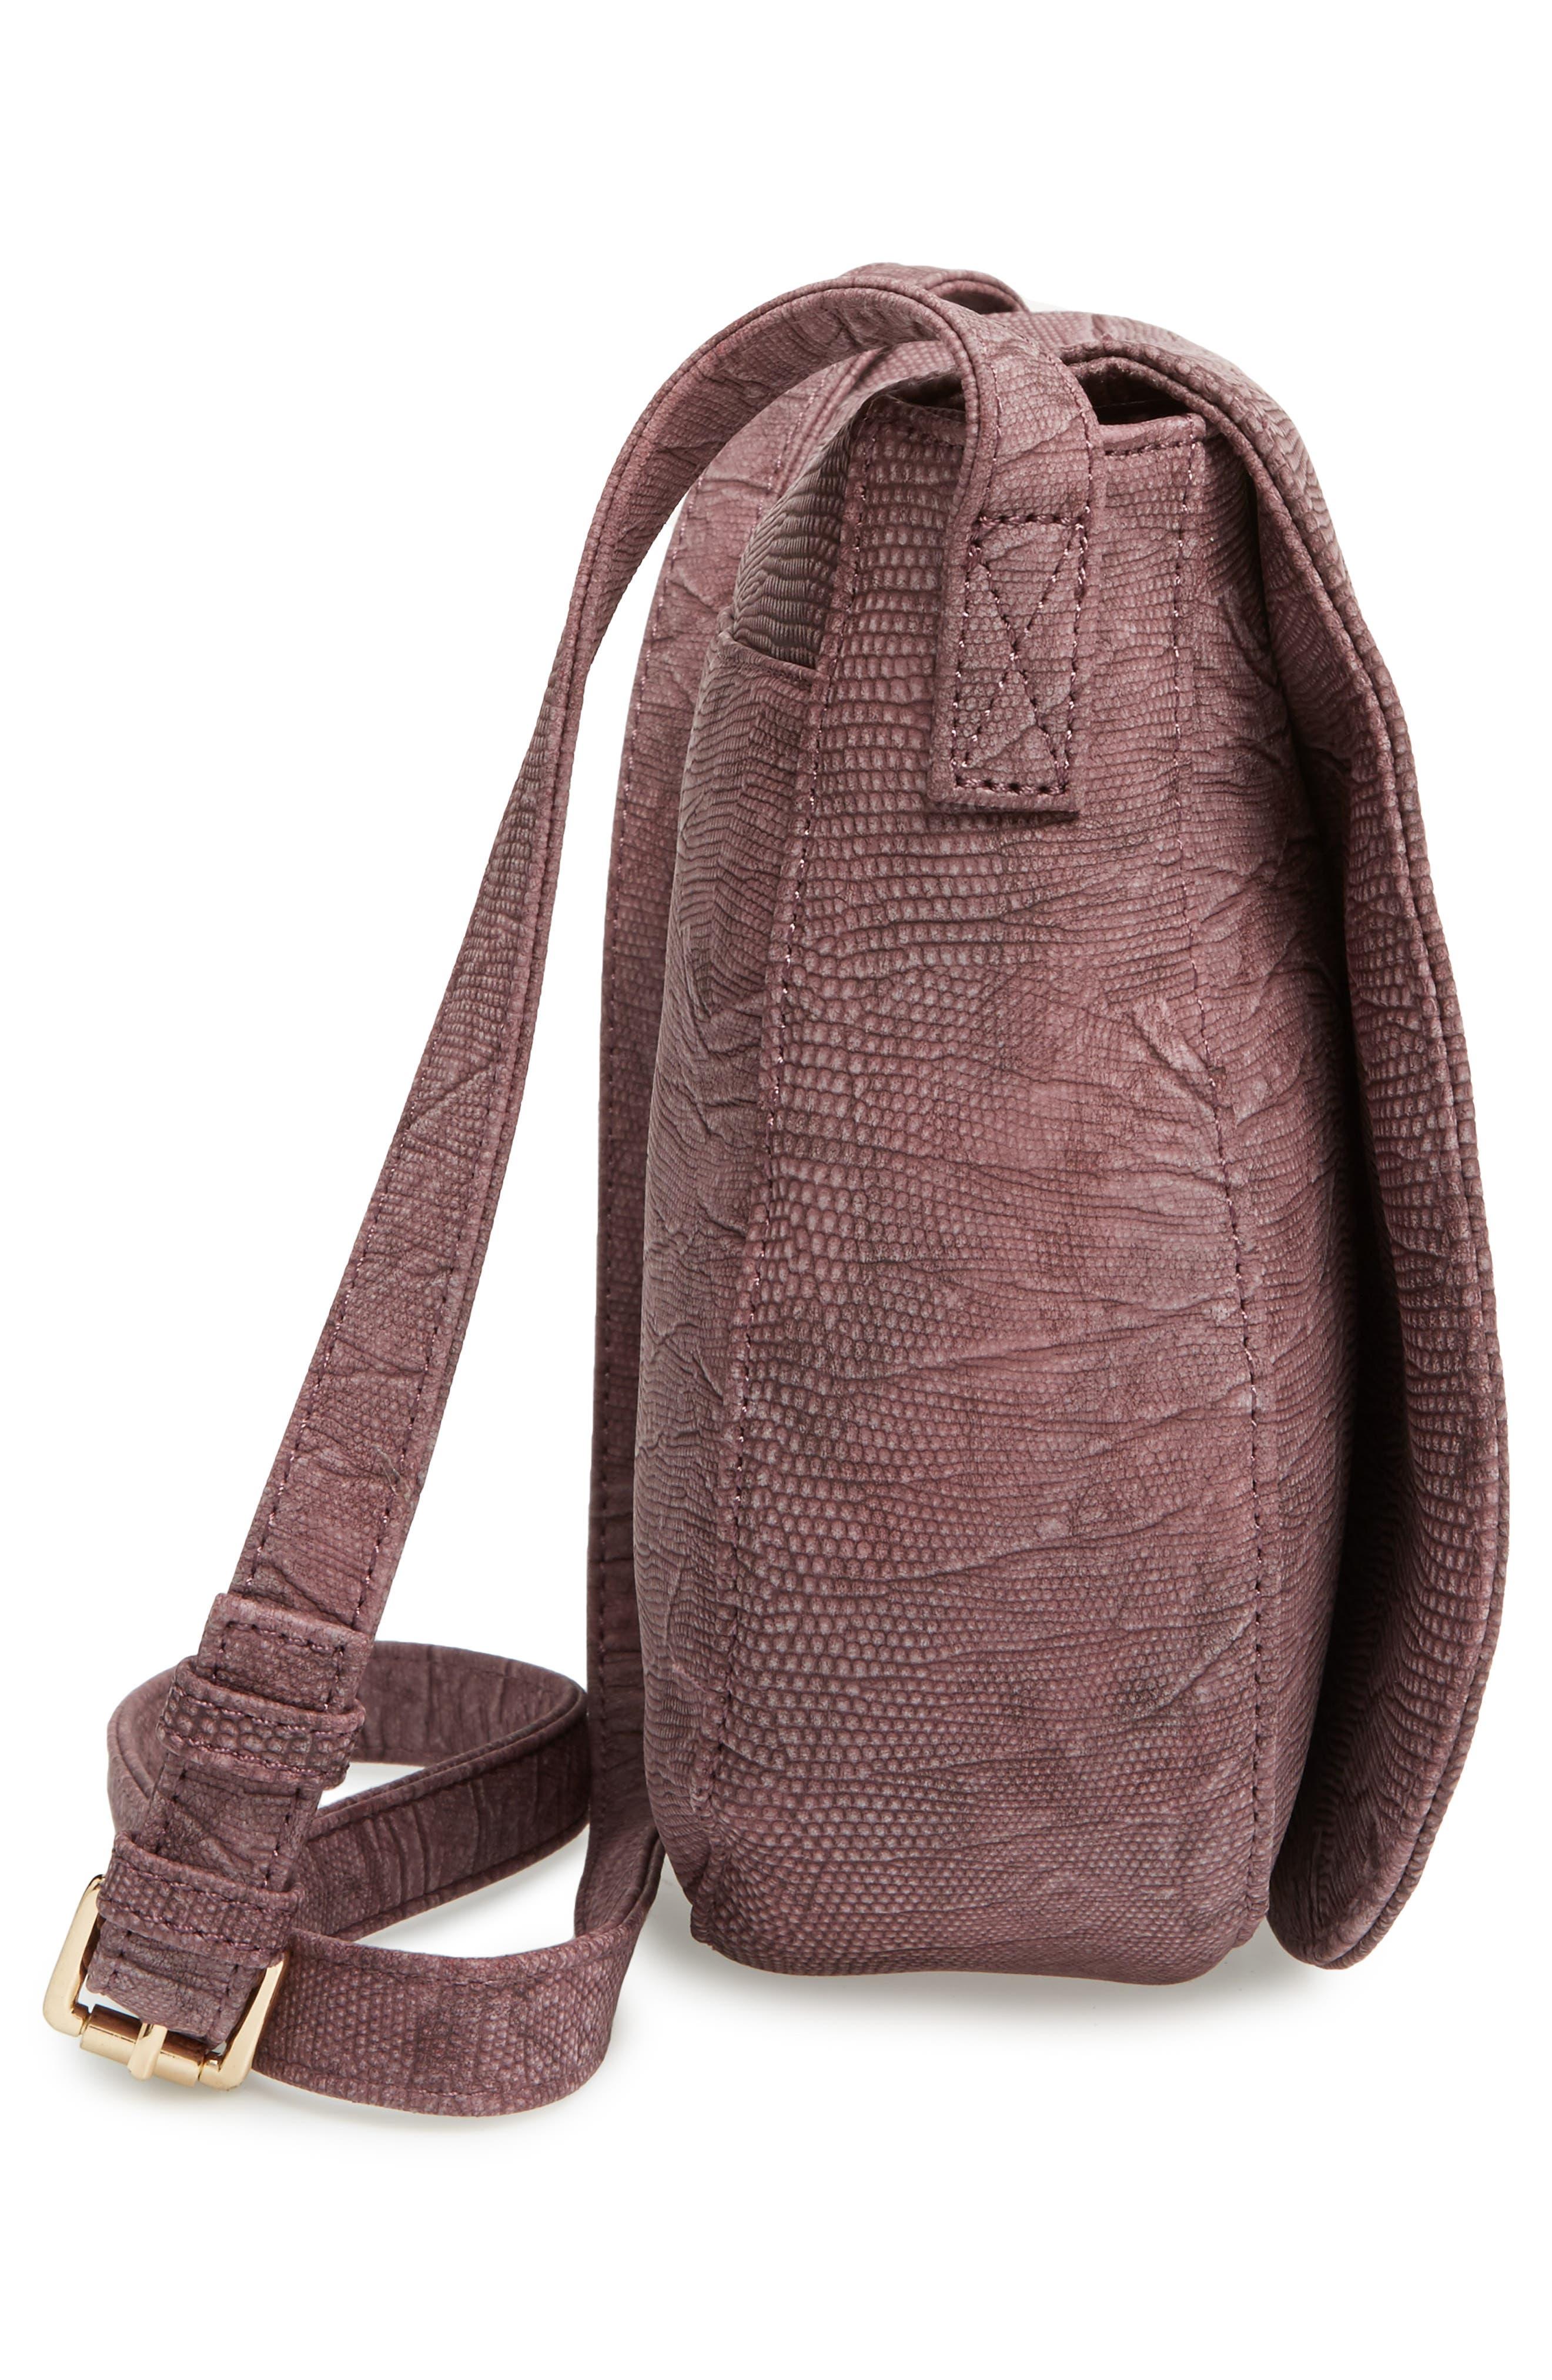 Livvy Faux Leather Crossbody Saddle Bag,                             Alternate thumbnail 15, color,